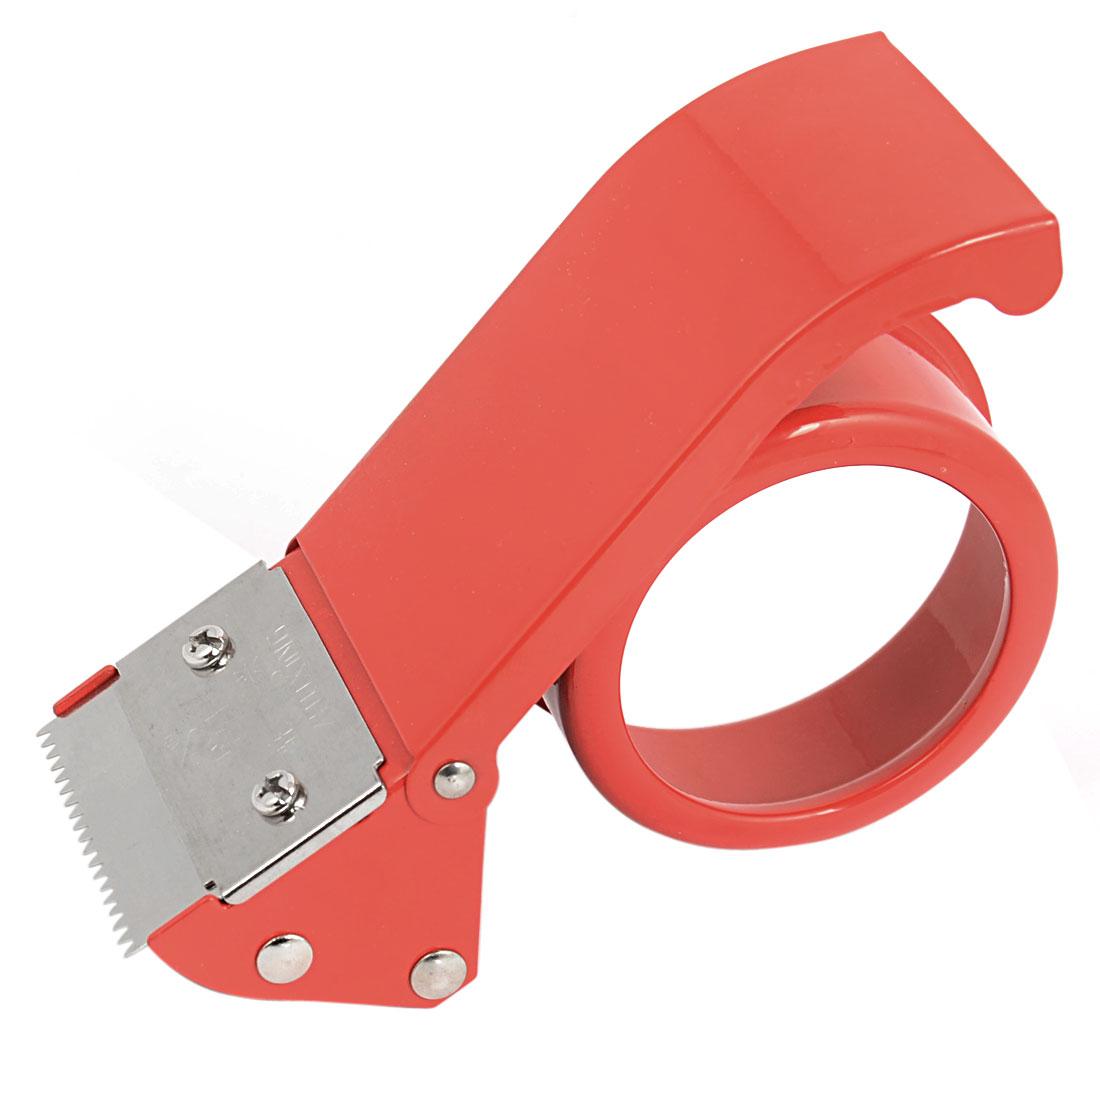 Unique Bargains Desktop Packaging Sealing 2  Width 8mm Inner Dia Tape Roll Cutter Dispenser Red